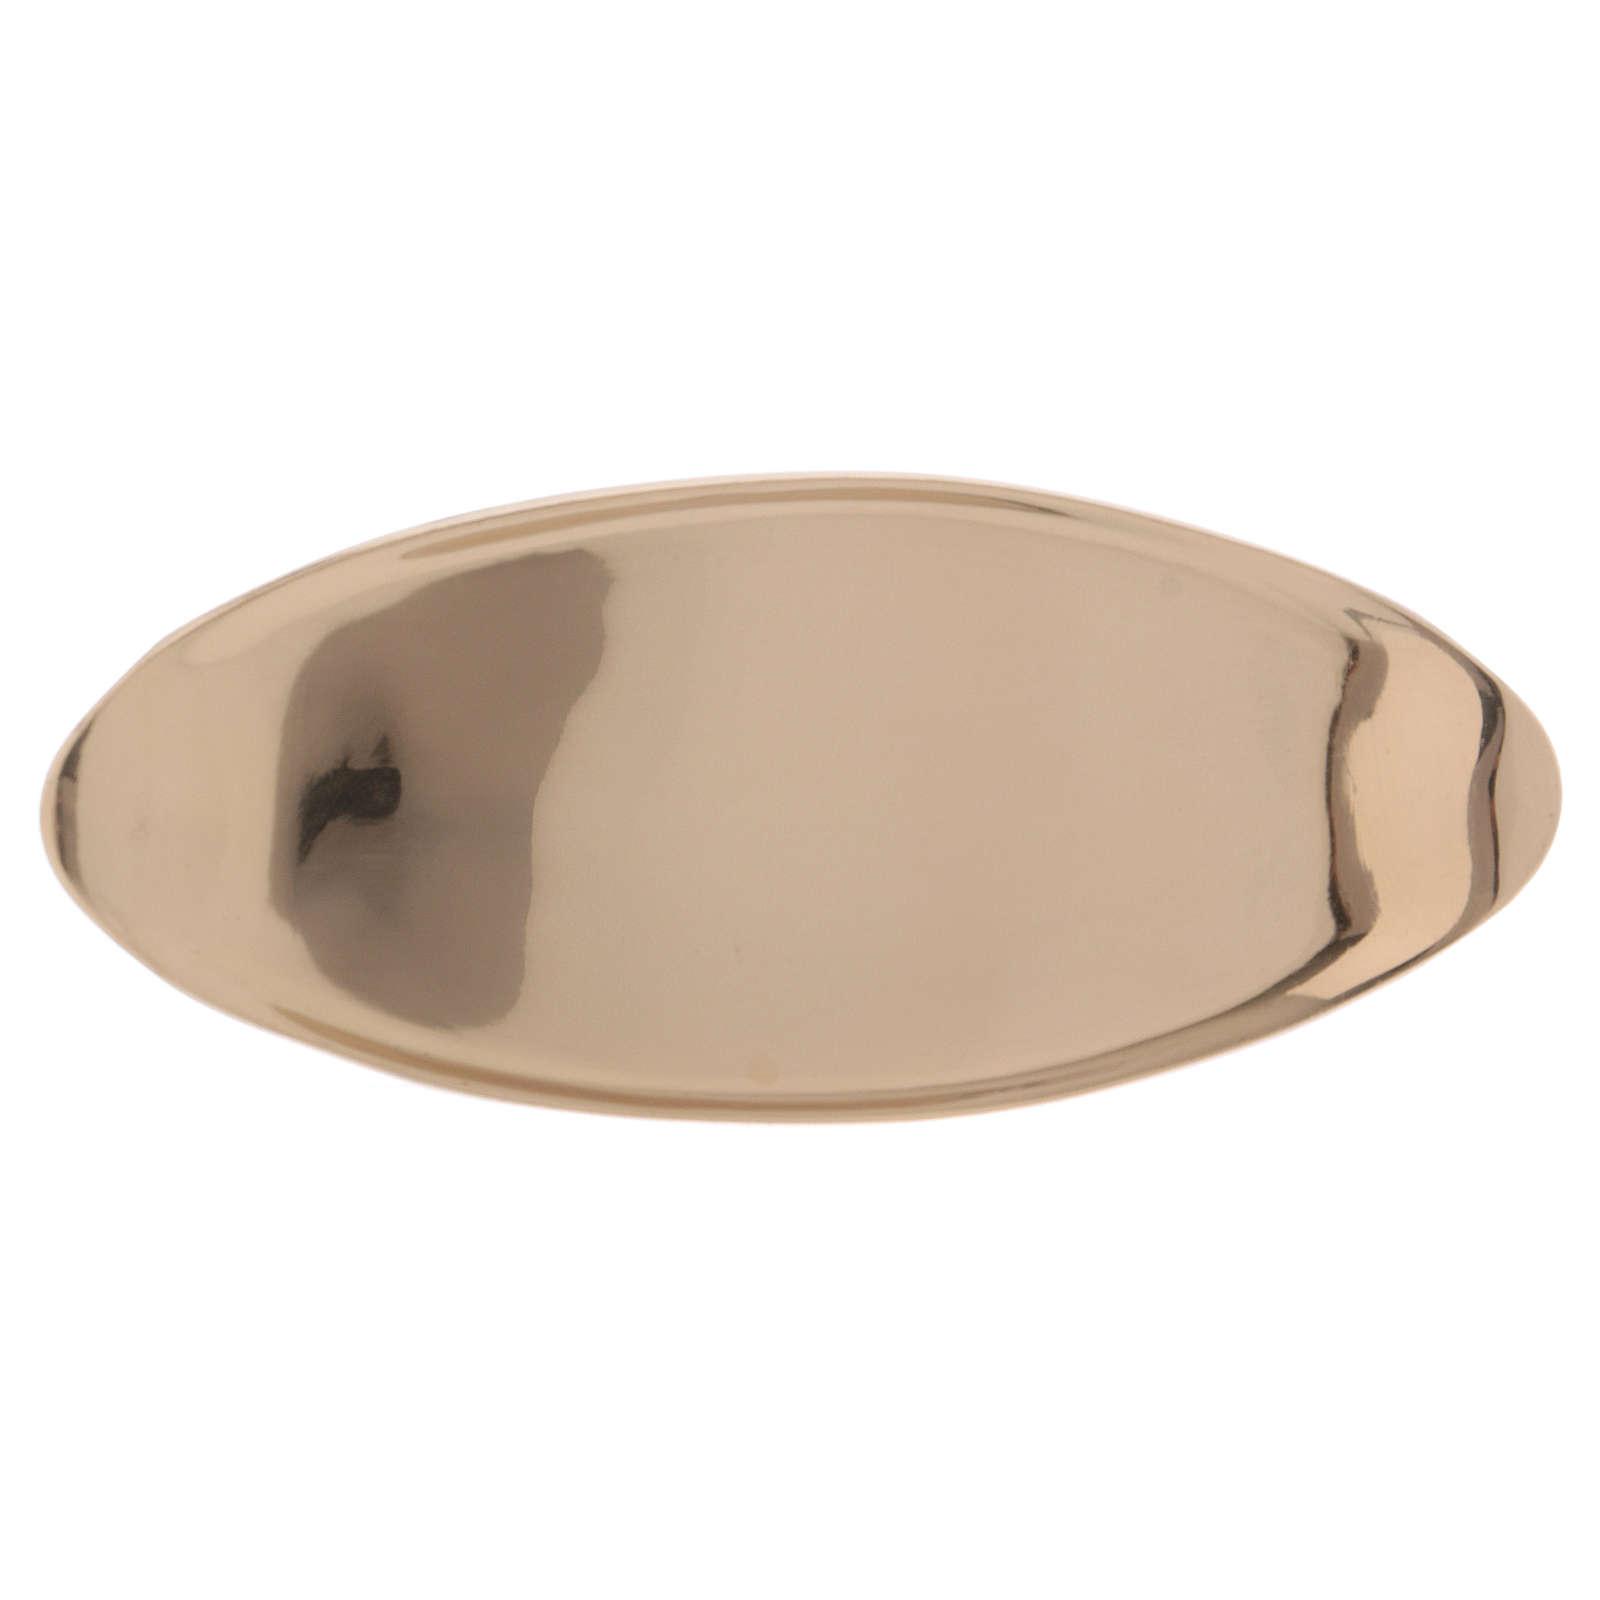 Portacandele ovale ottone dorato lucido 3